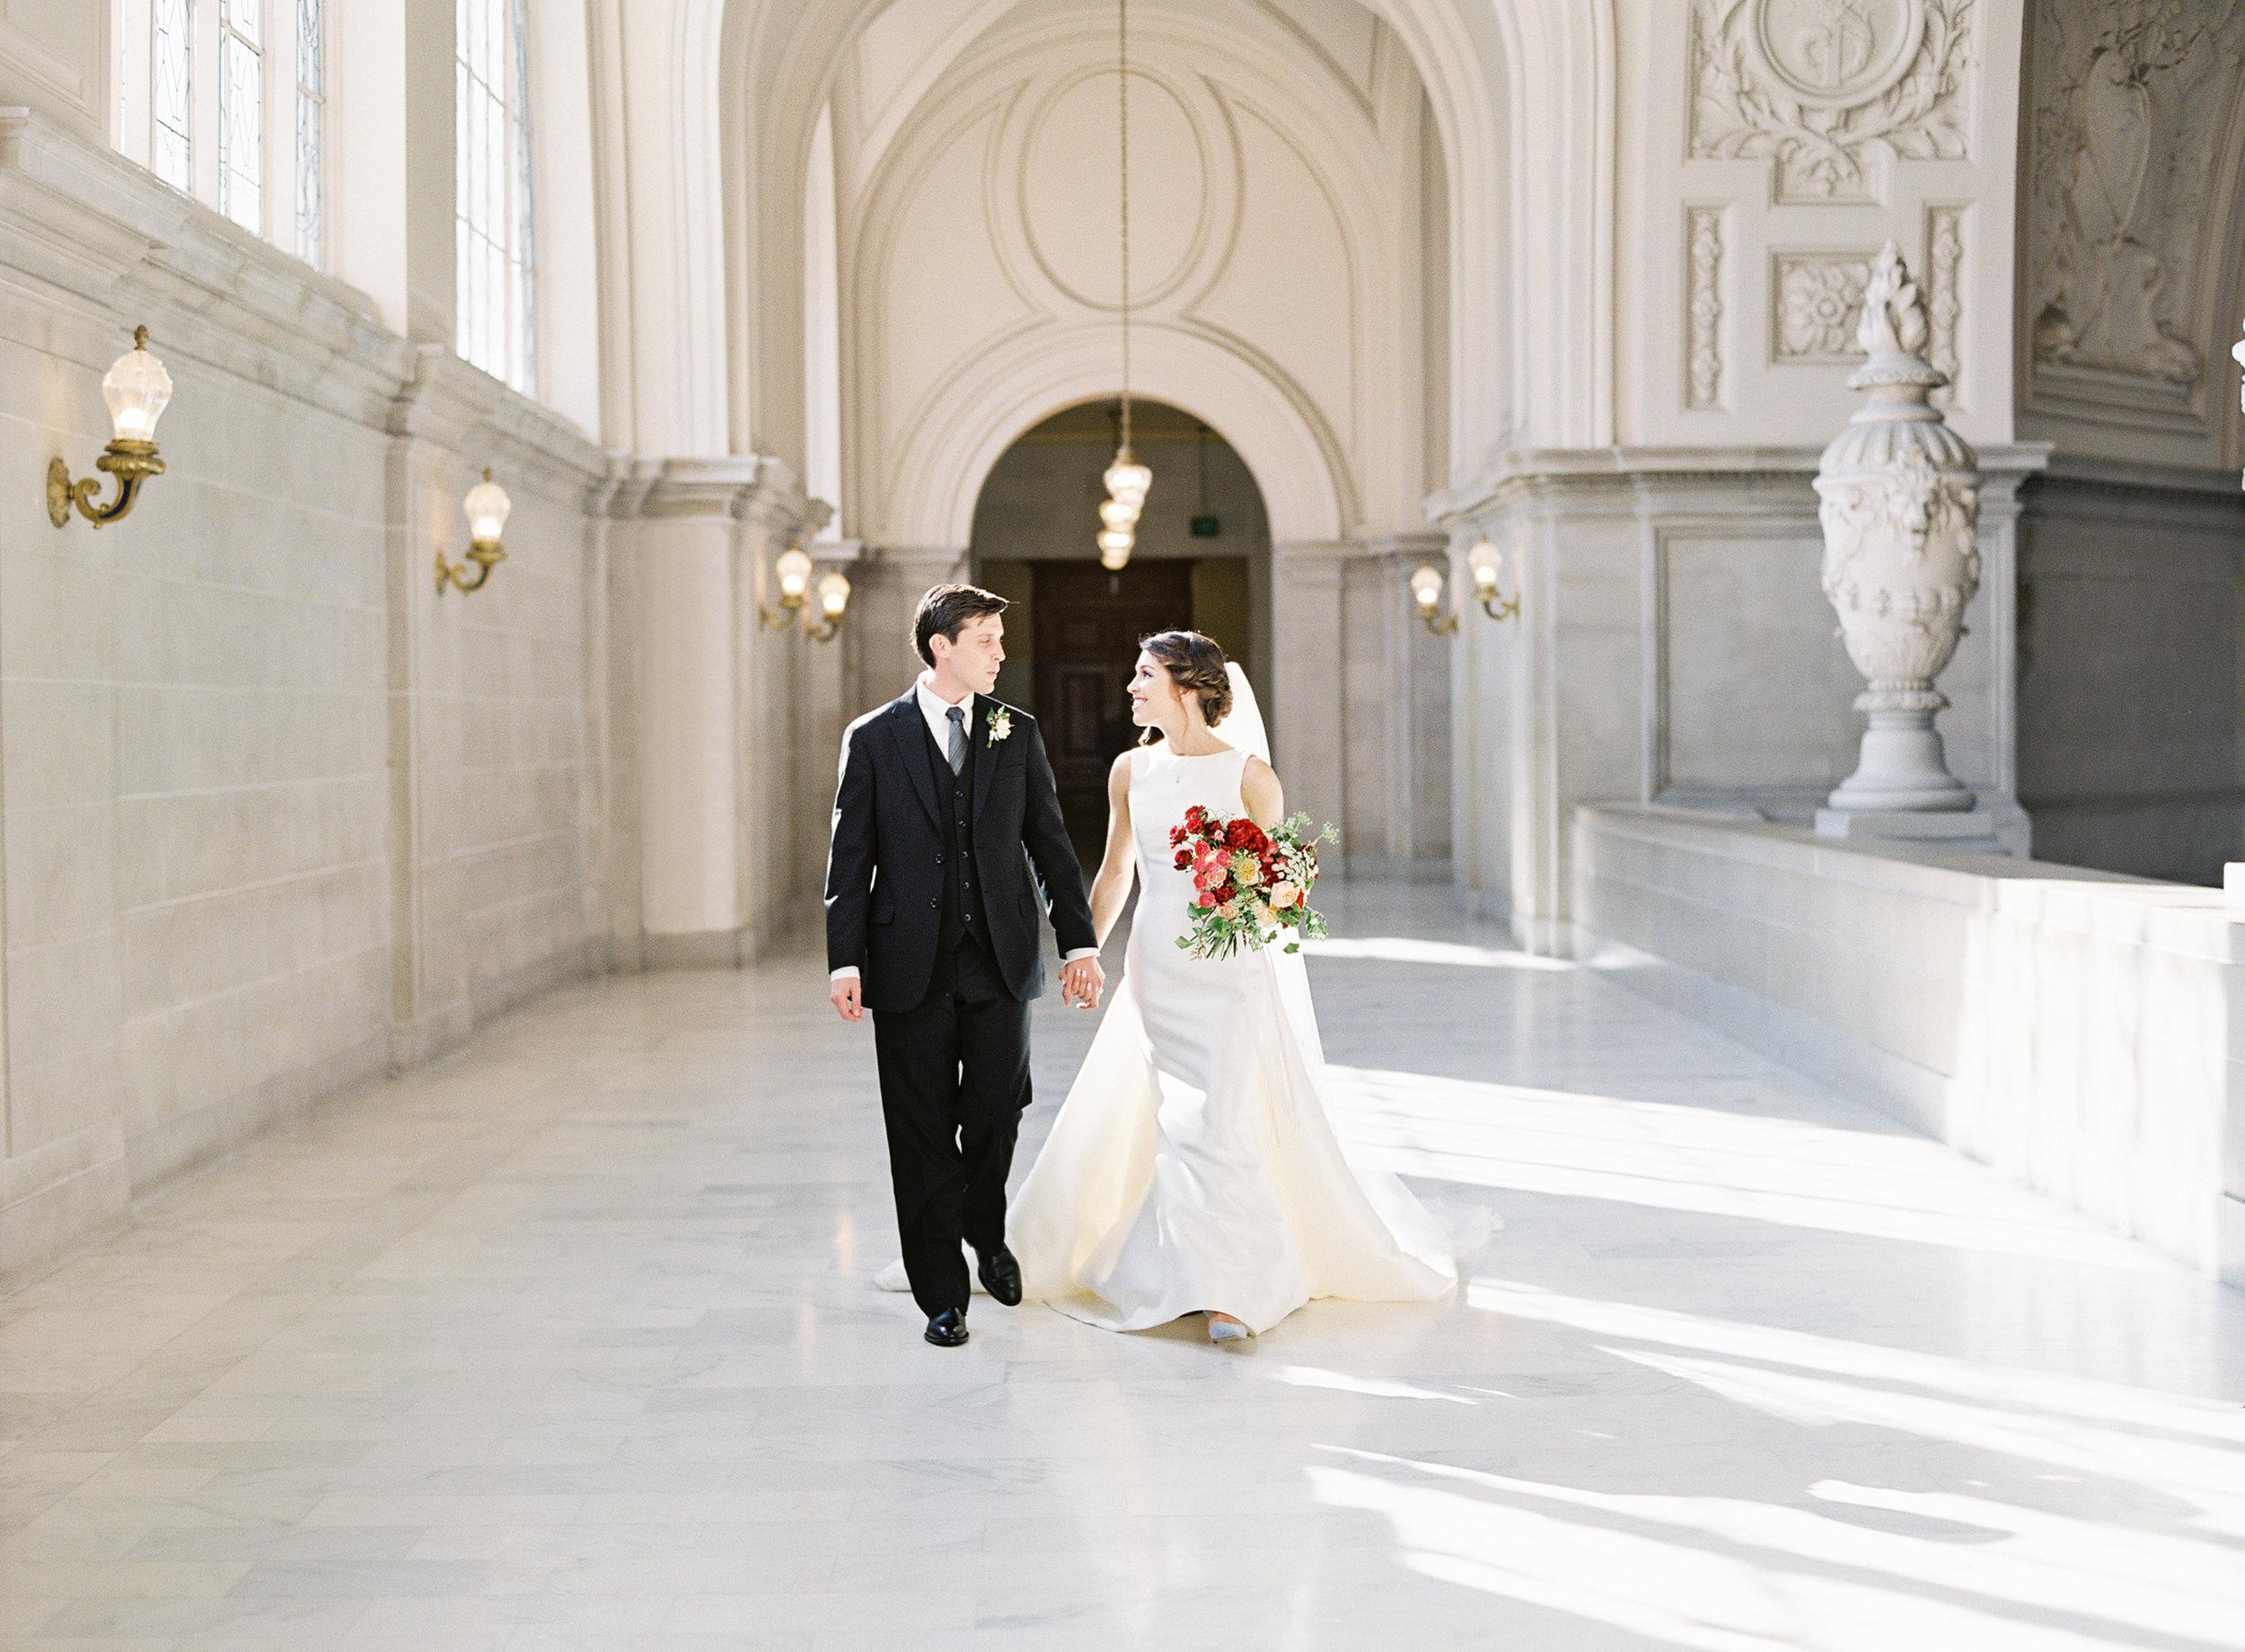 Meghan Mehan Photography - California Wedding Photographer | San Francisco City Hall Wedding 033.jpg